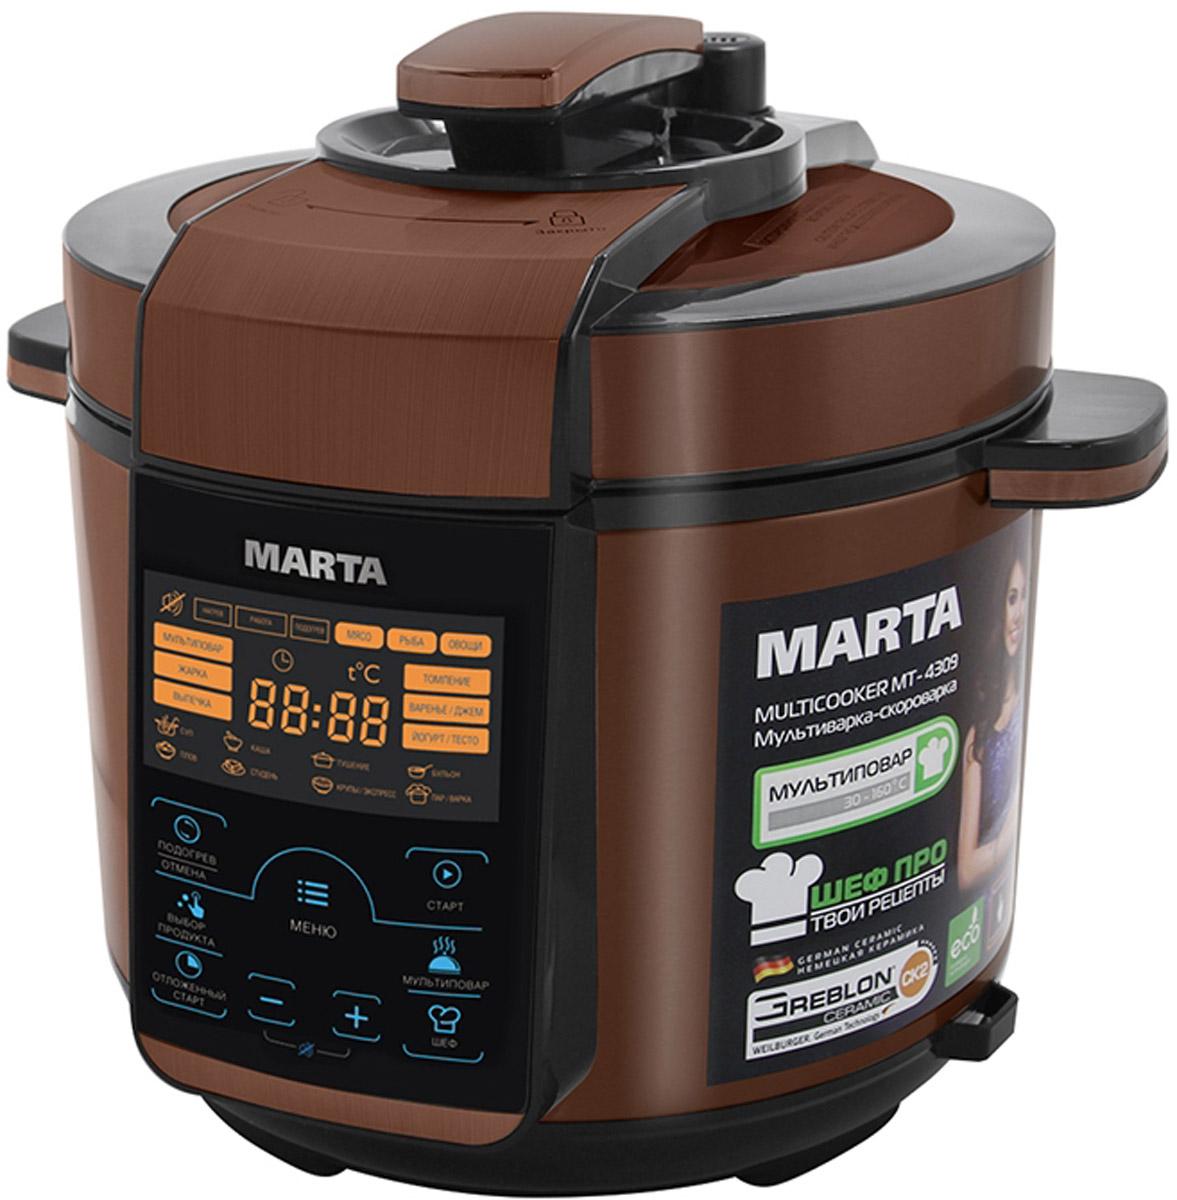 Marta MT-4309, Black Cooper мультиварка